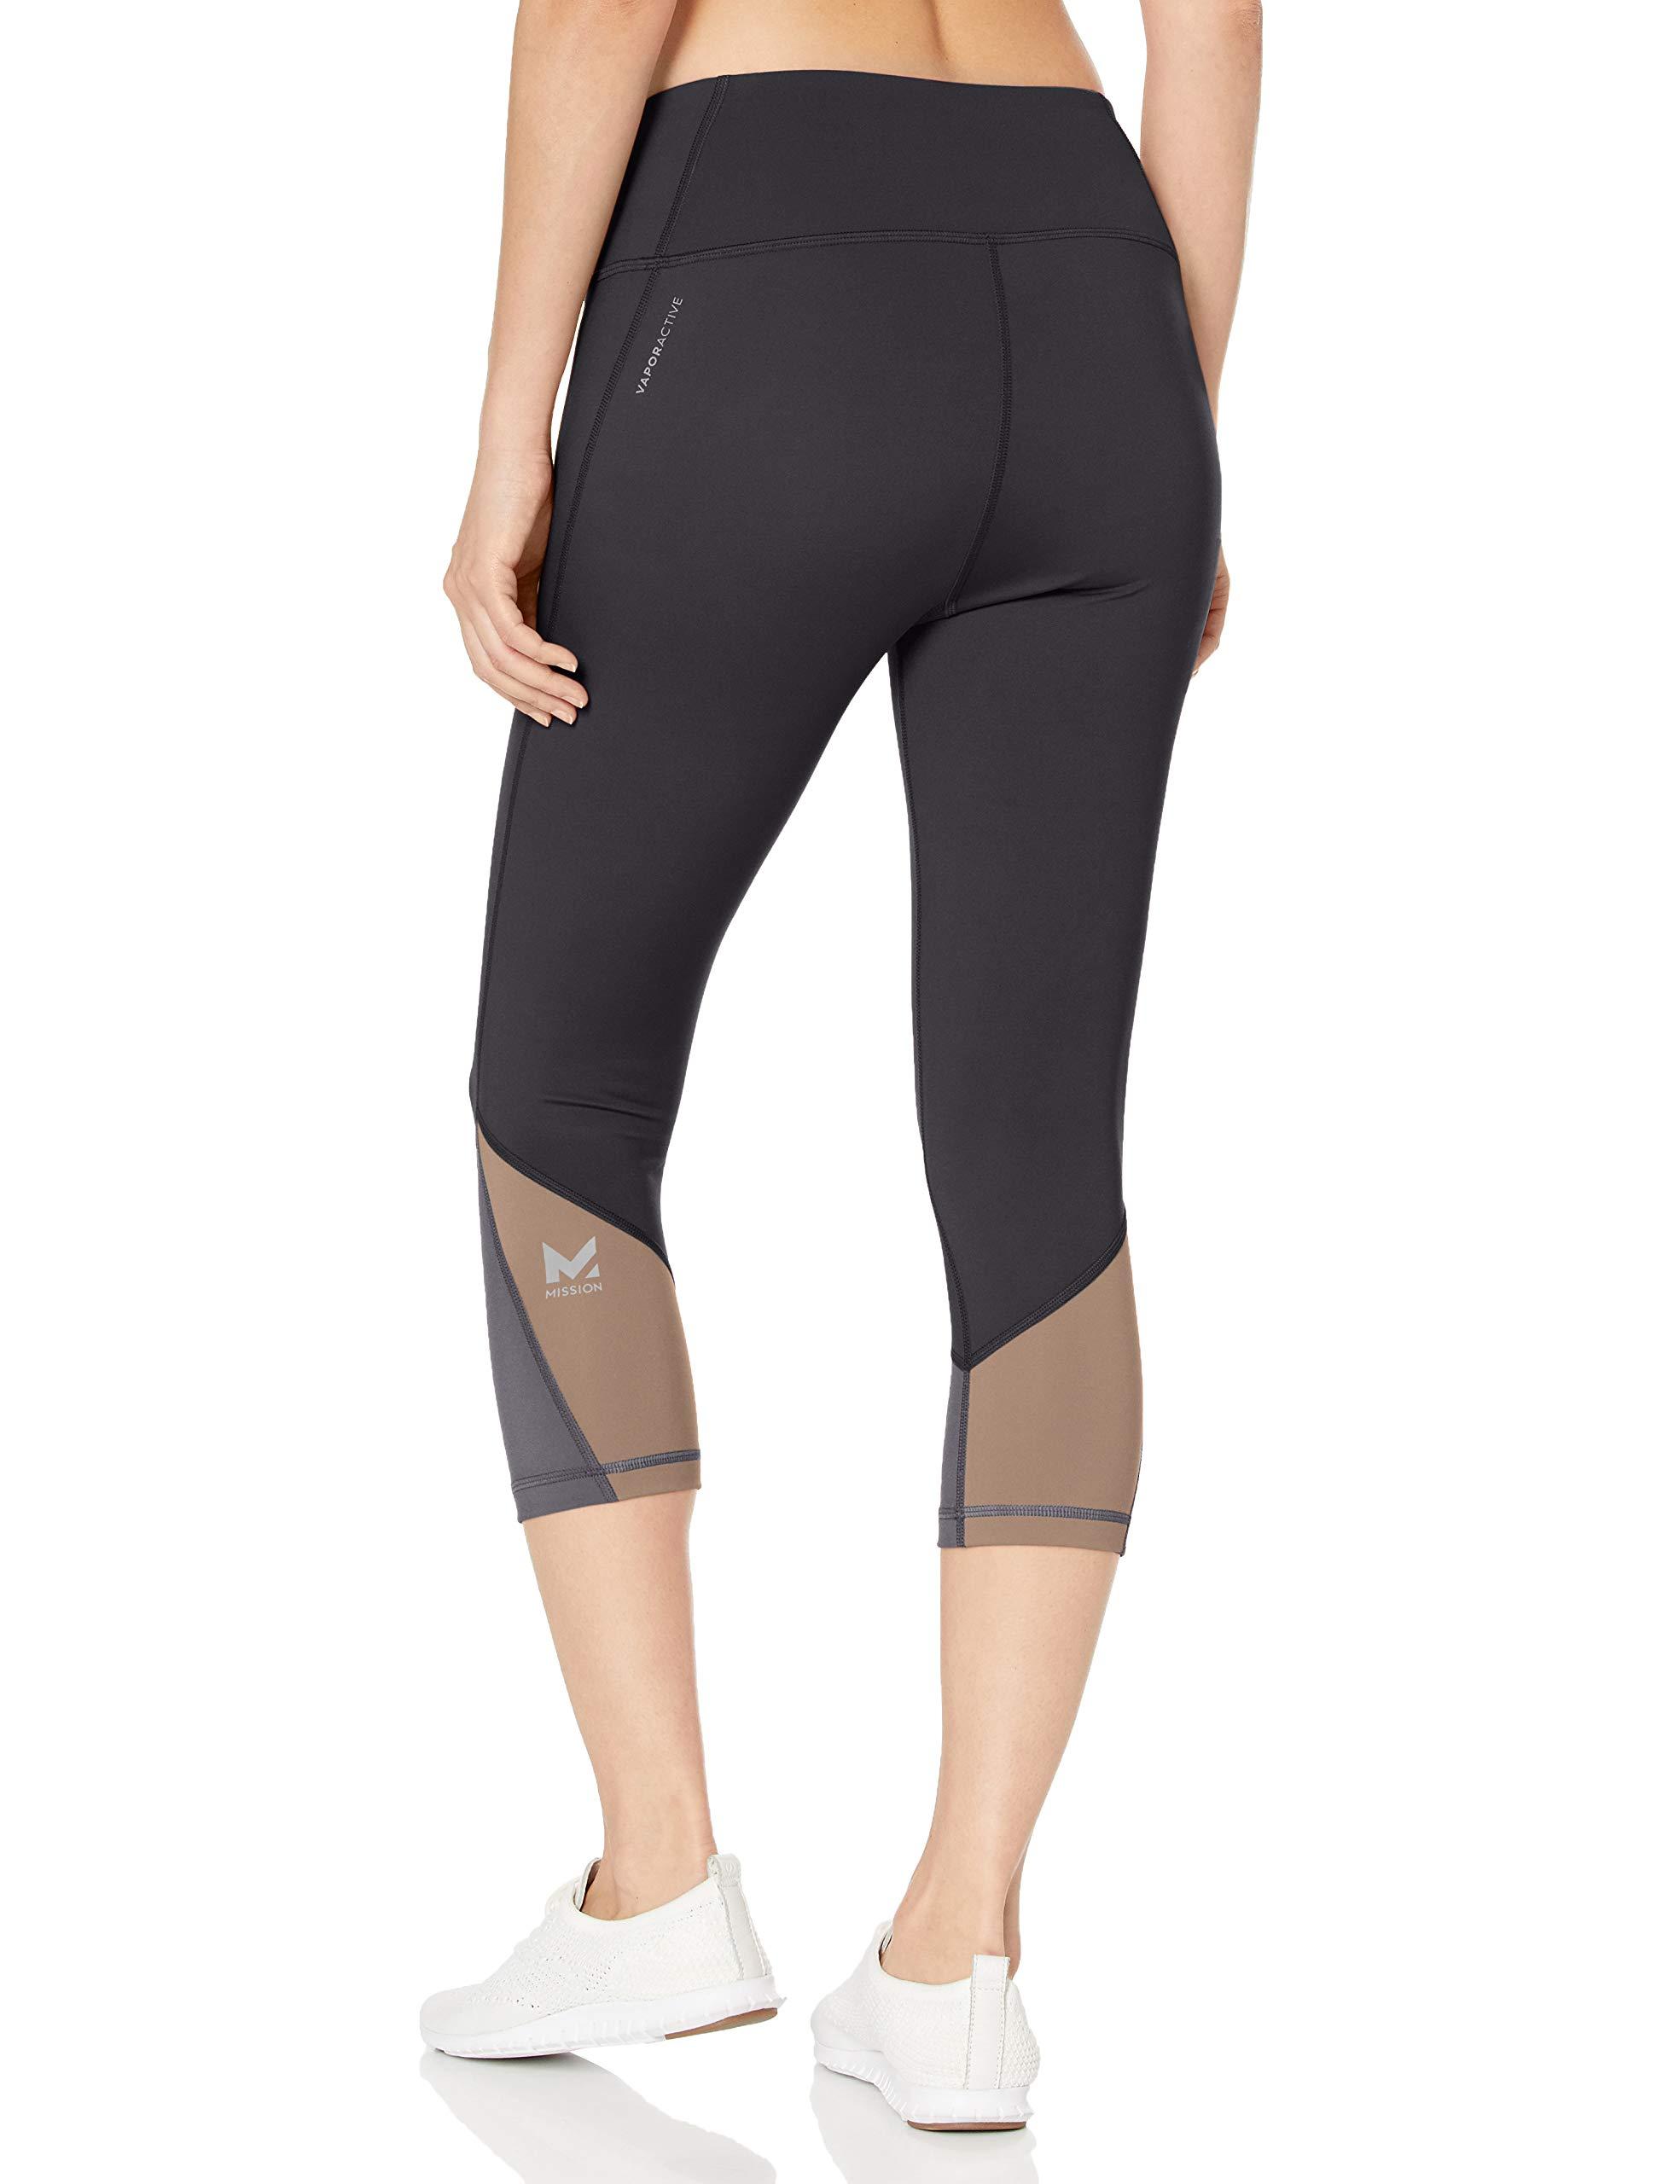 Mission Women's VaporActive System Mid-Rise Capri Leggings, Moonless Night/Funghi, Medium